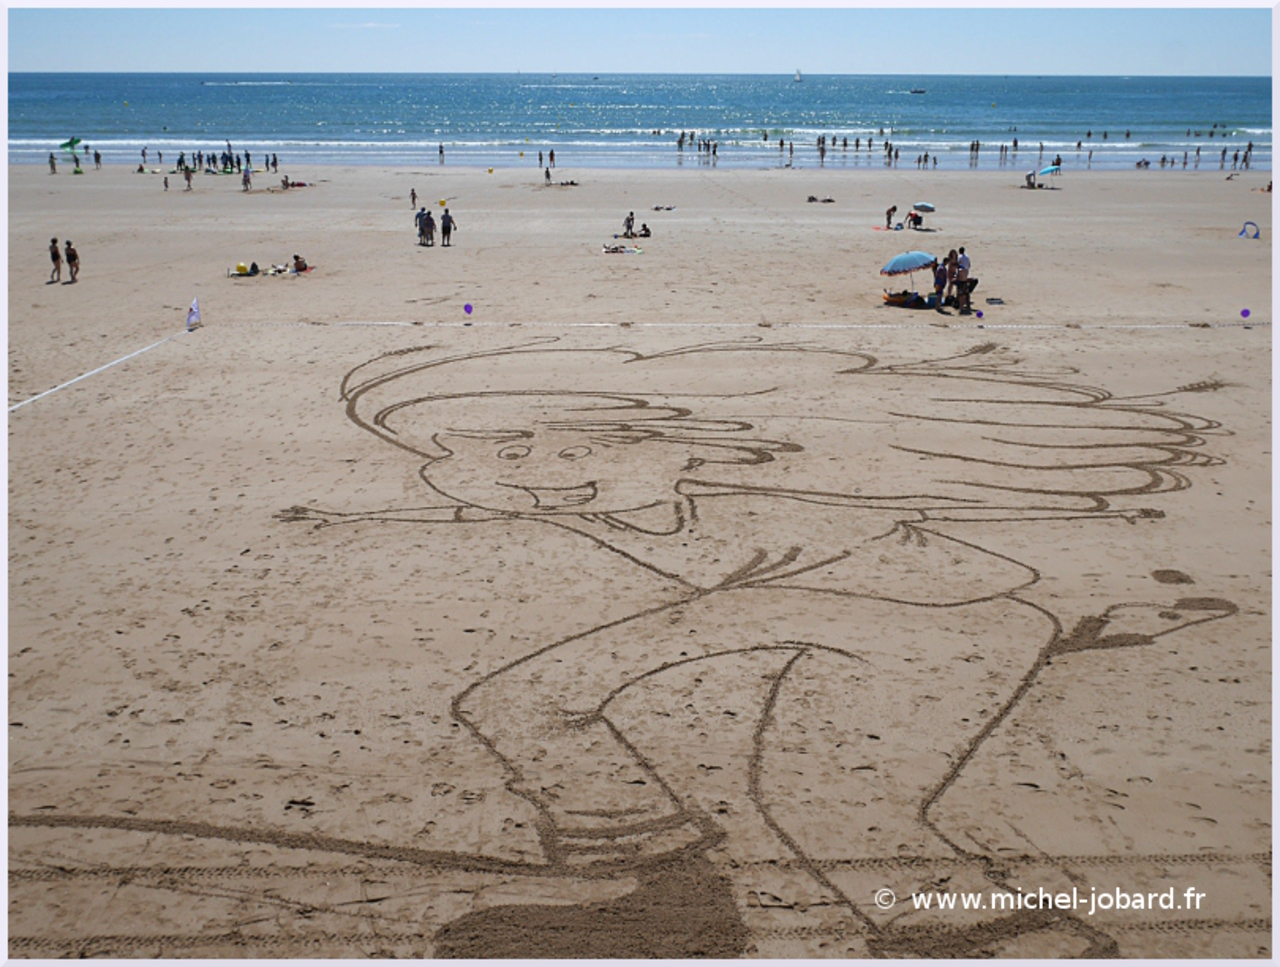 Beach-art-Terre-de-Jim-04